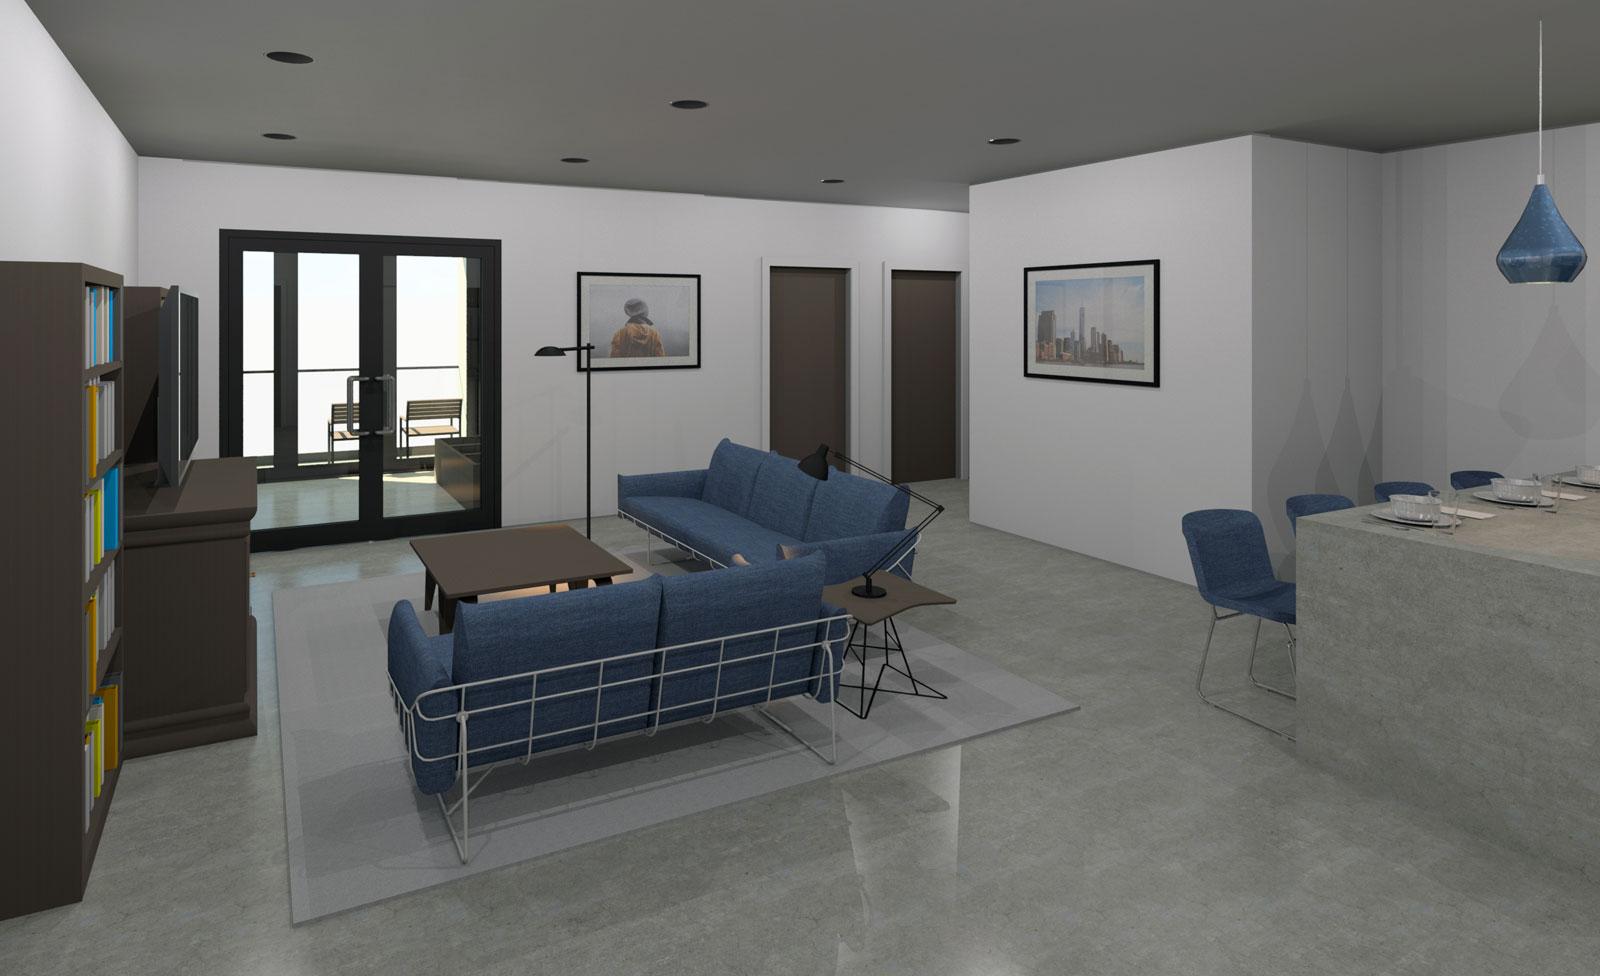 2 Bedroom Interior Post Processed 01